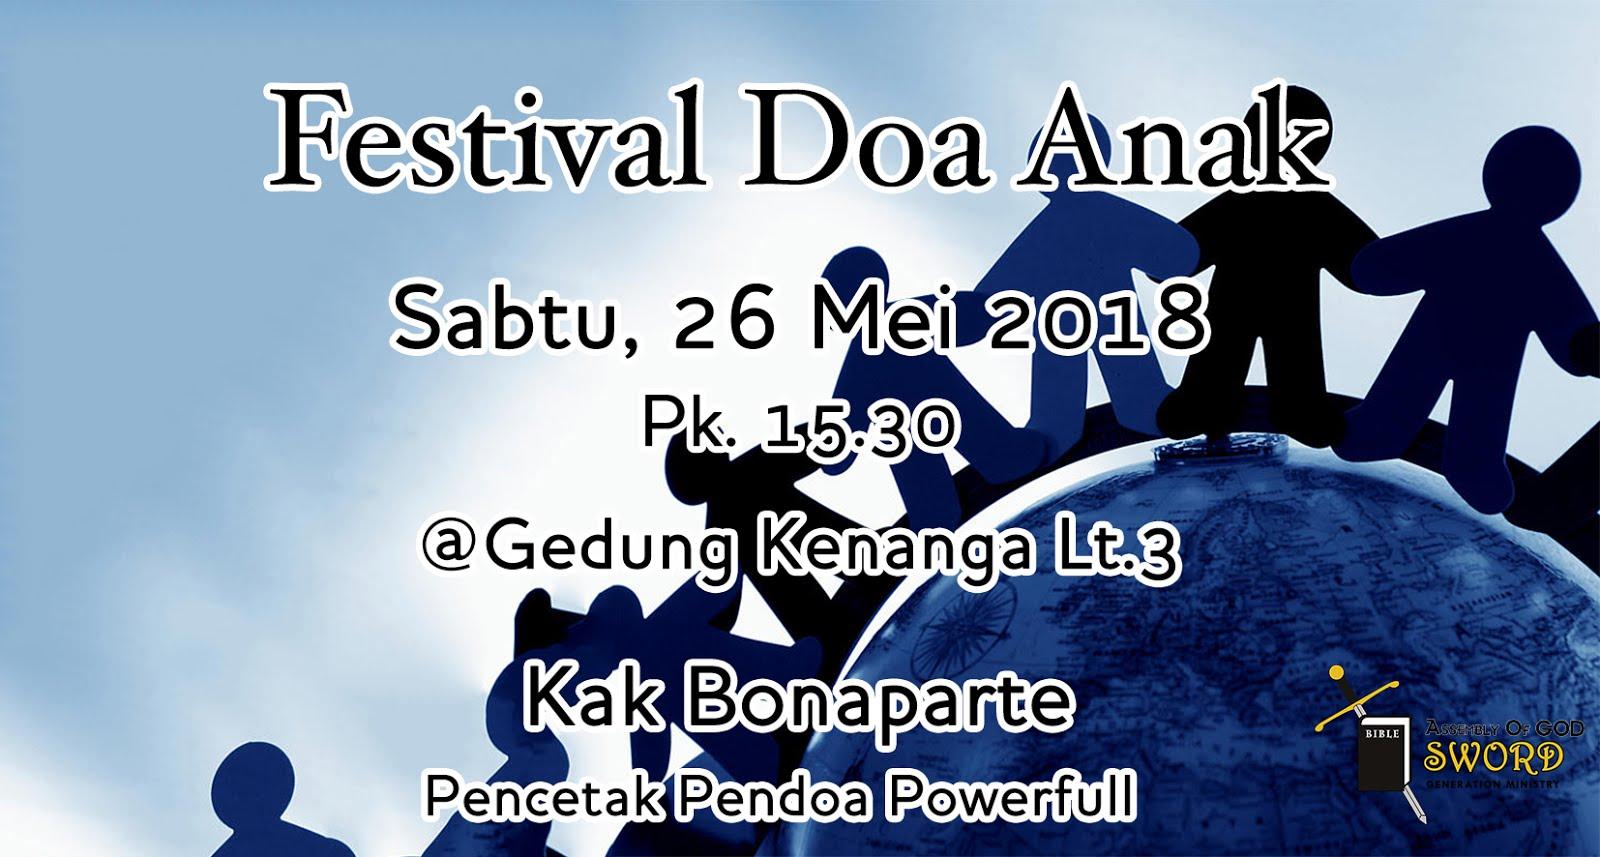 Festival Doa Anak, Sabtu 26 Mei 2018 Jam 15.30